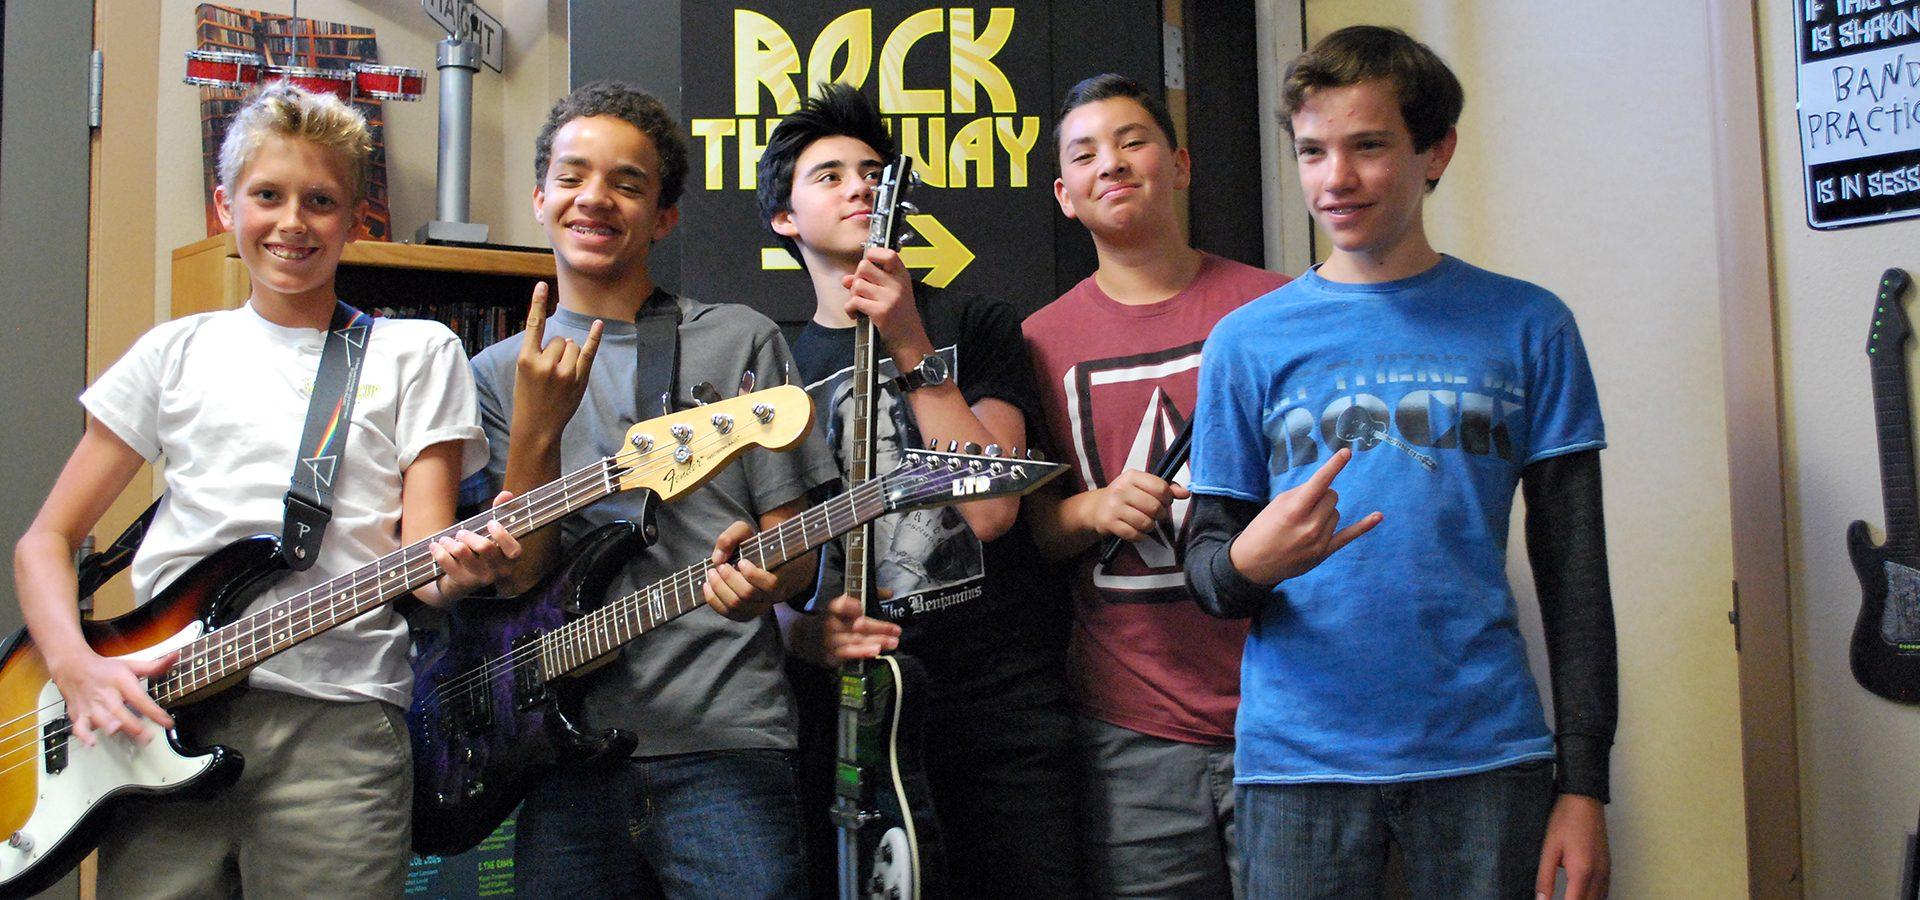 Rock Band Music Camp - Boys Band - Sherman Oaks, Los Angeles - Join The Band